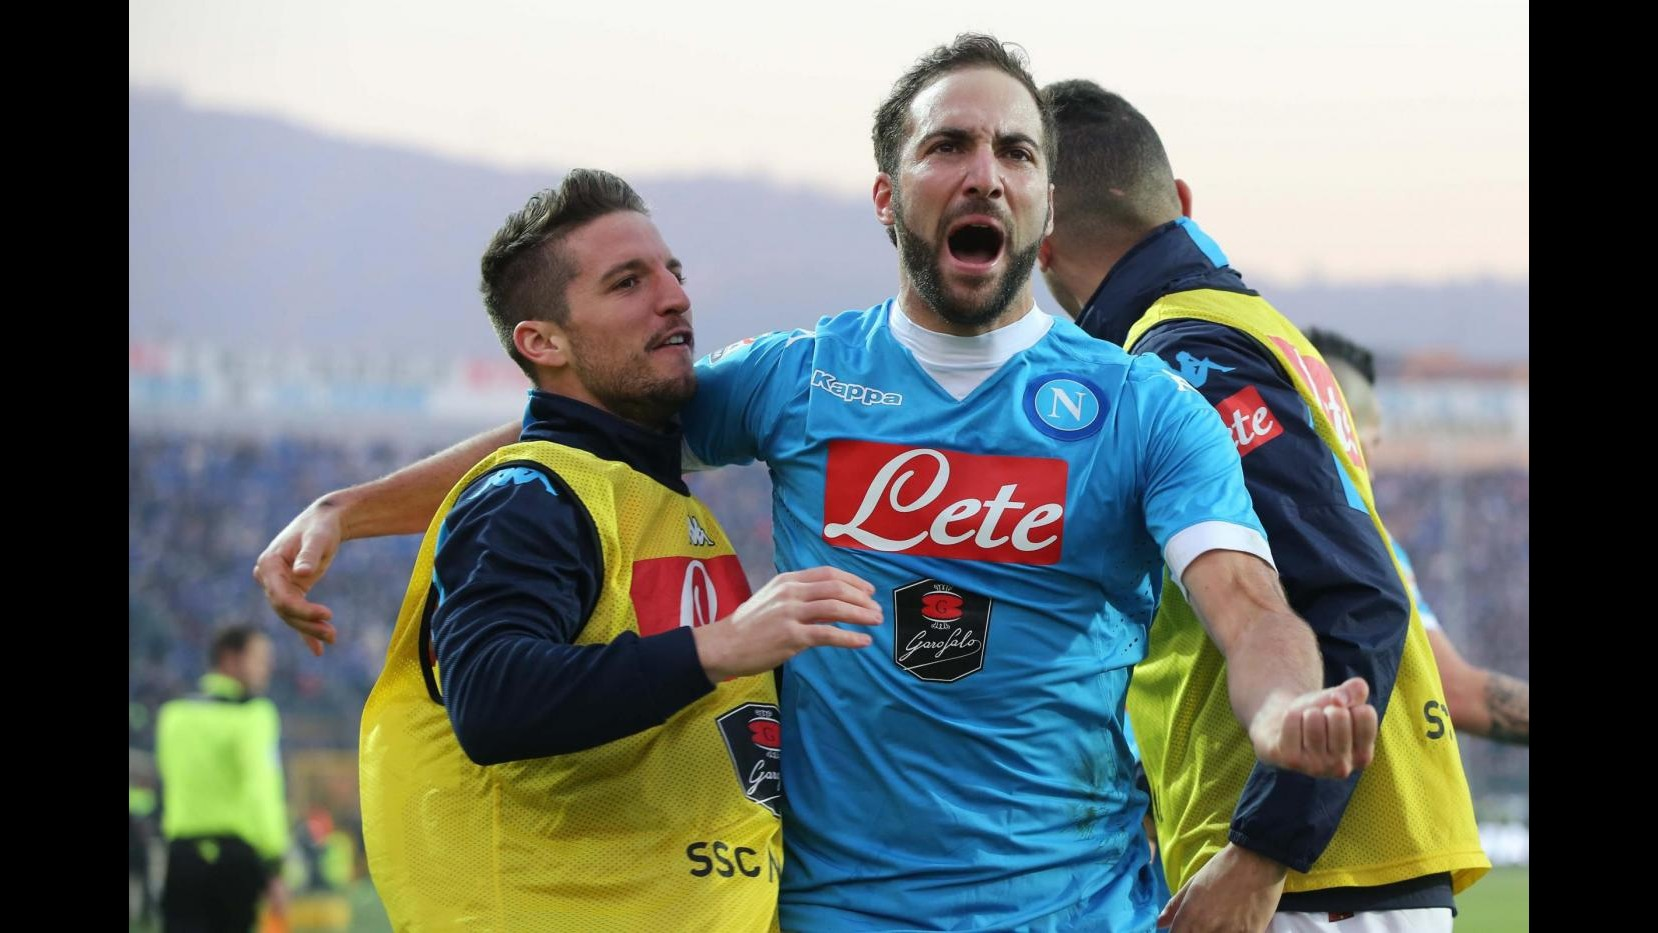 Serie A, super Higuain spinge il Napoli: Atalanta ko 3-1